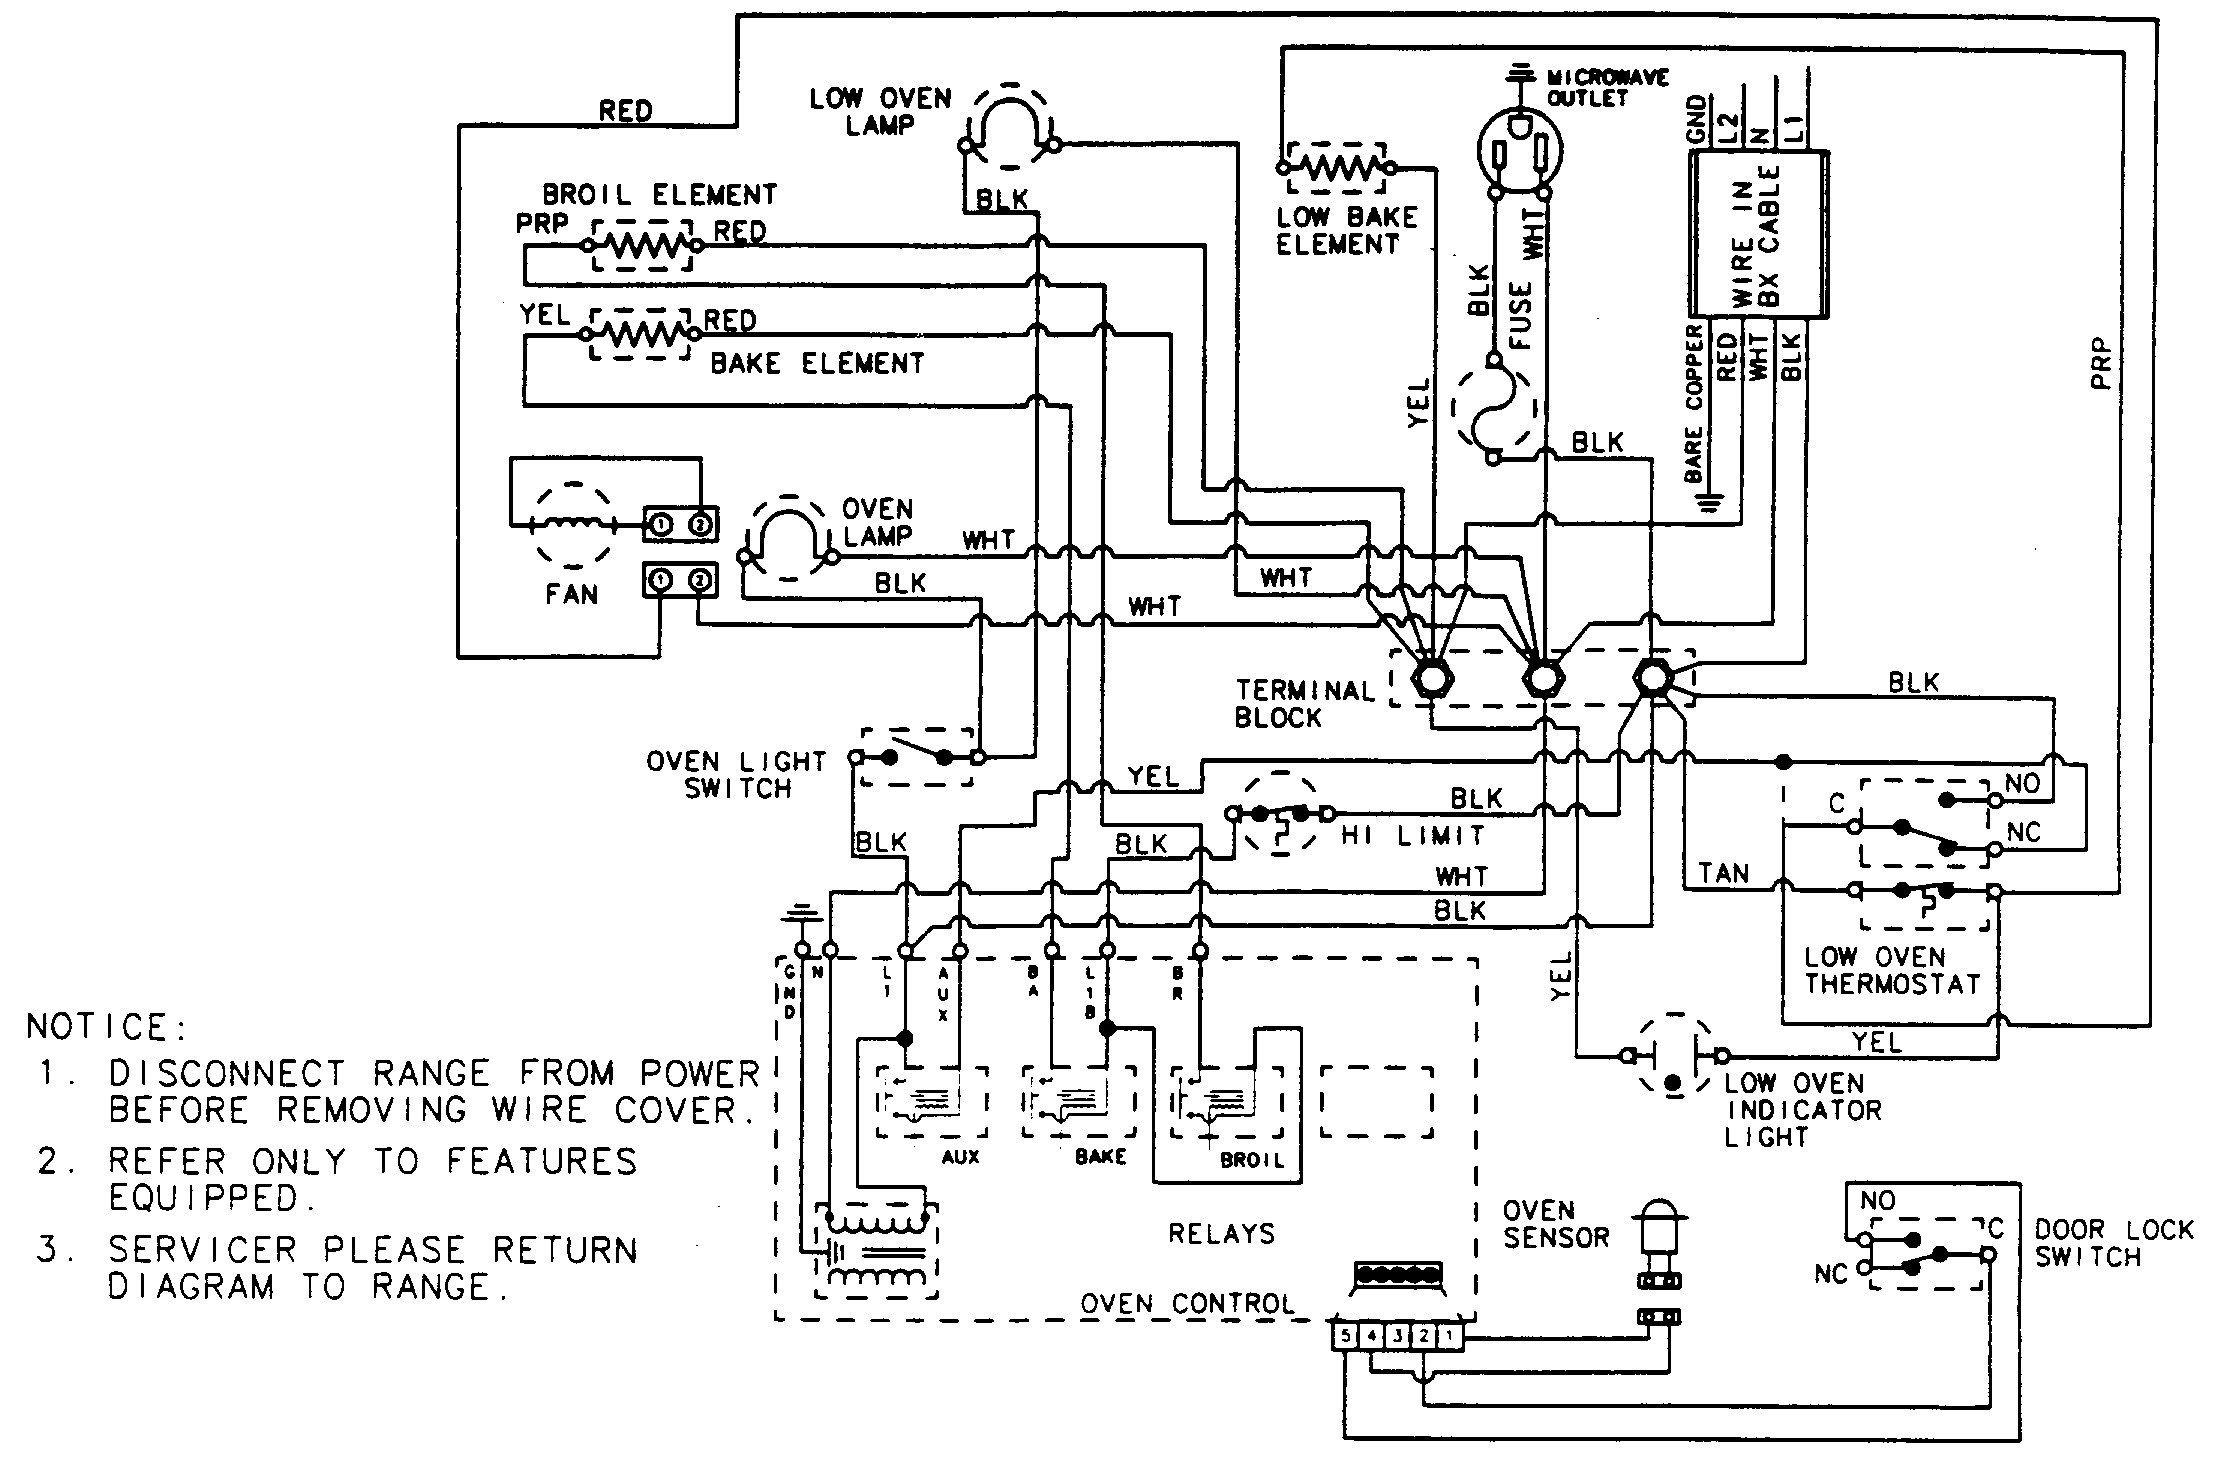 foscam wiring diagram, manufacturing wiring diagram, midea wiring diagram, benq wiring diagram, roper wiring diagram, apple wiring diagram, viking wiring diagram, sears wiring diagram, crosley wiring diagram, broan wiring diagram, toshiba wiring diagram, danby wiring diagram, panasonic wiring diagram, estate wiring diagram, vivitar wiring diagram, msi wiring diagram, braun wiring diagram, o2 wiring diagram, dcs wiring diagram, apc wiring diagram, on haier oven wiring diagram